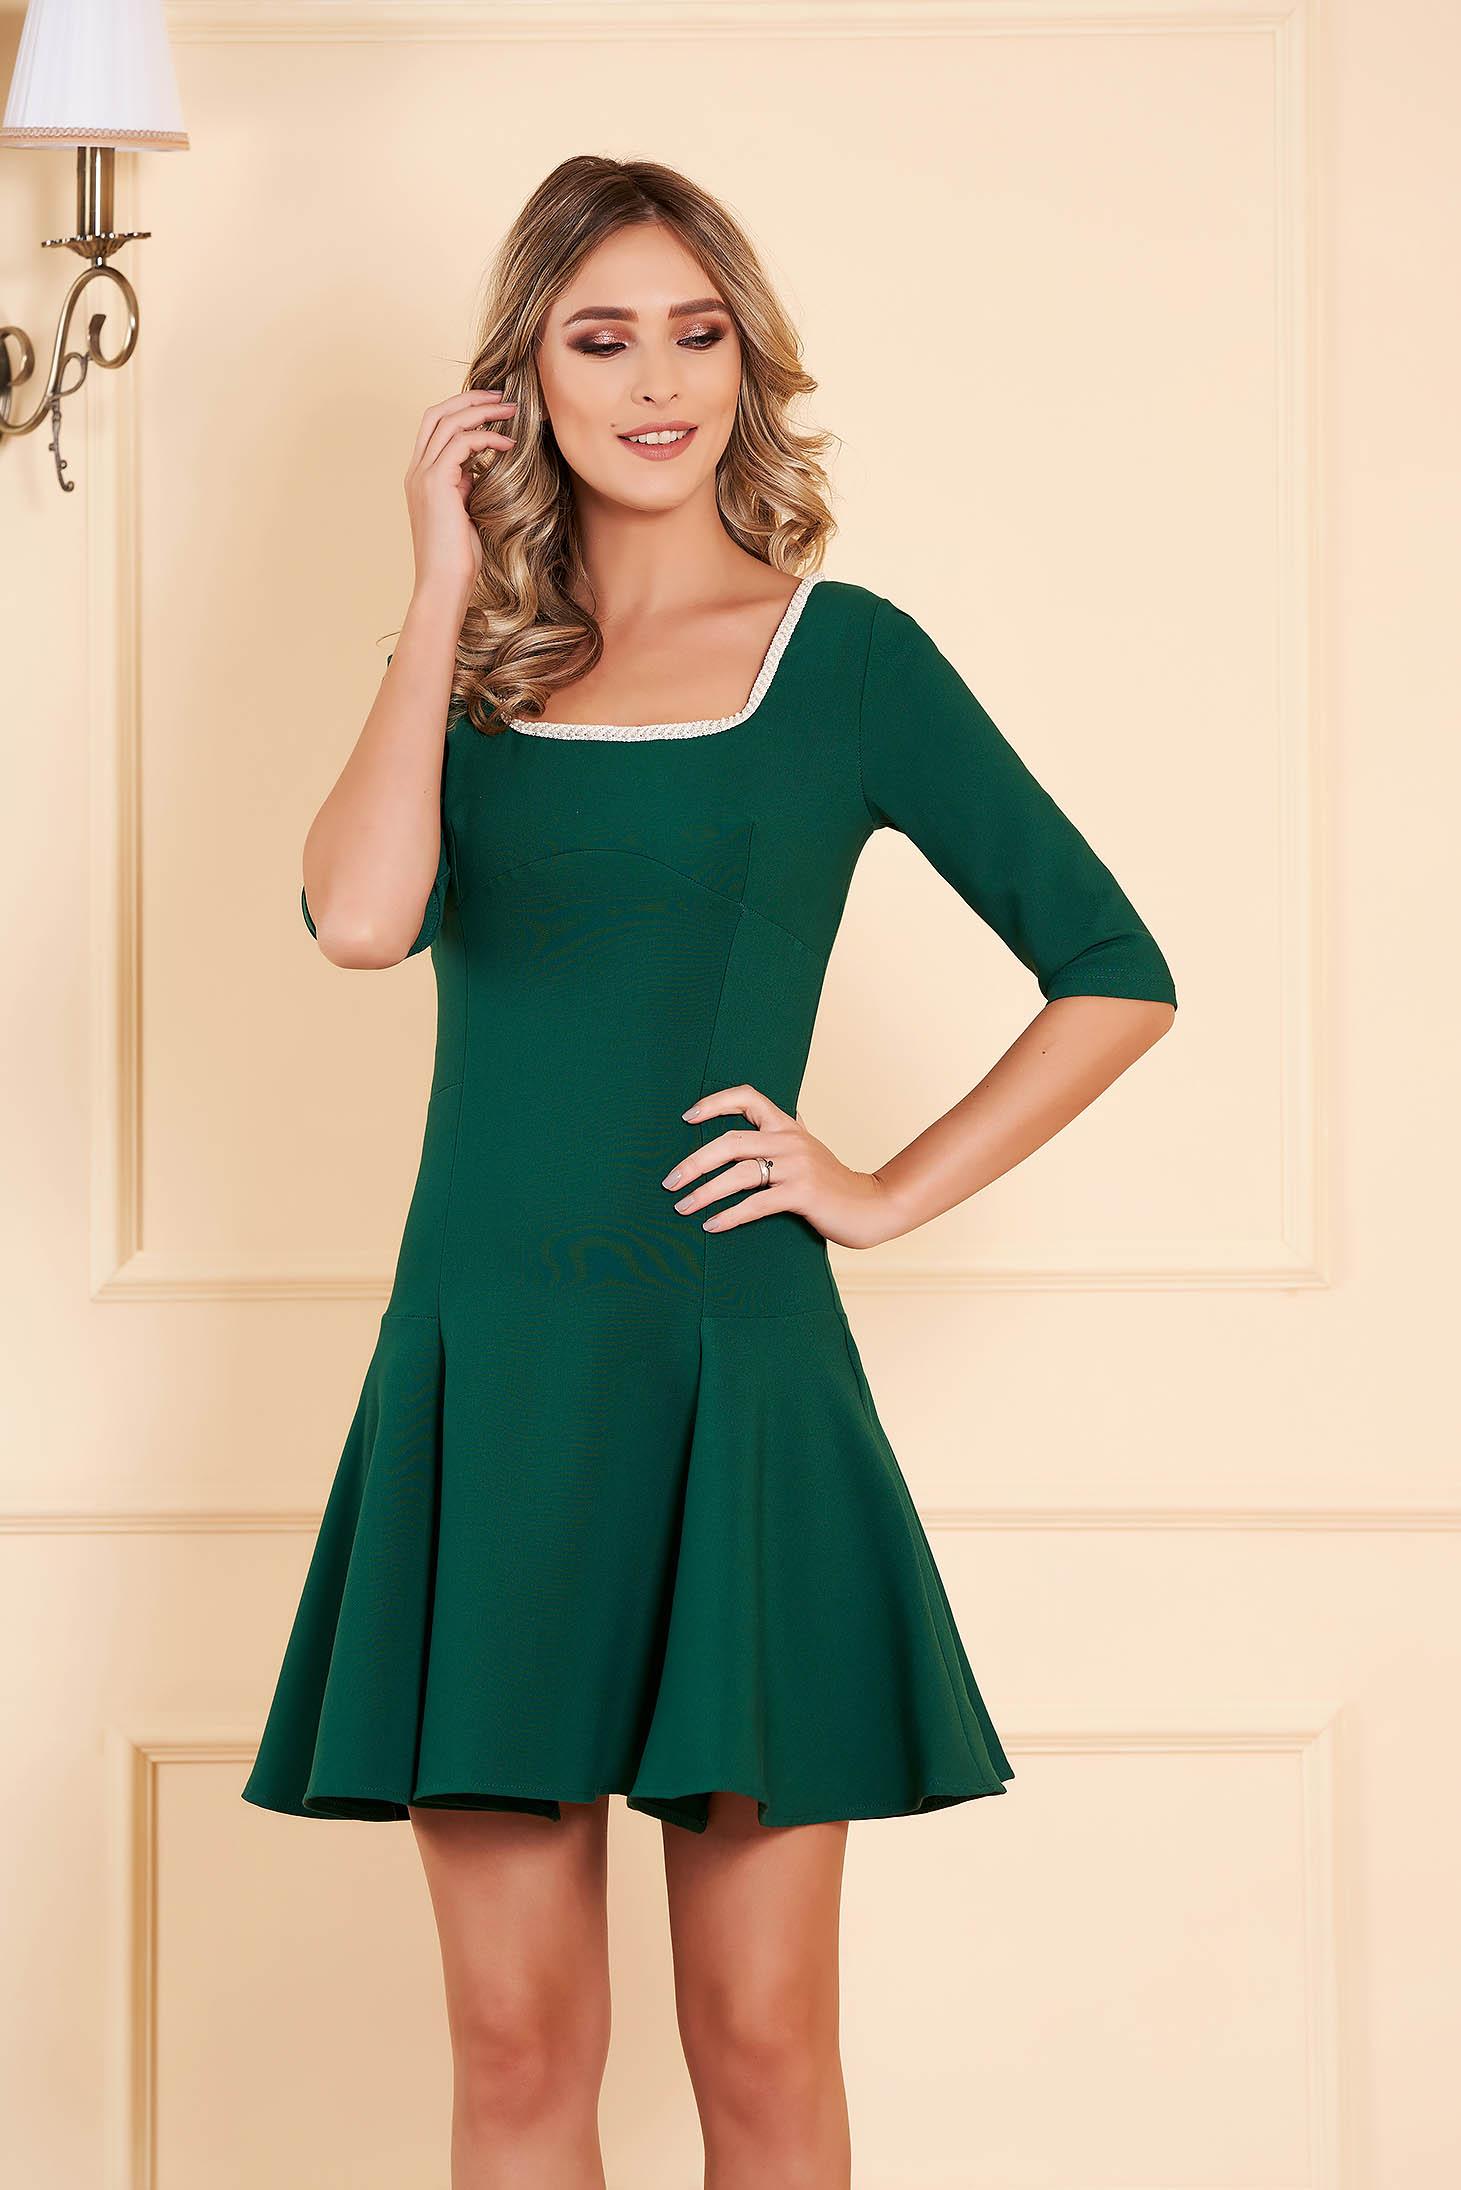 Rochie verde de ocazie croi in clos scurta din stofa usor elastica cu maneci trei-sferturi